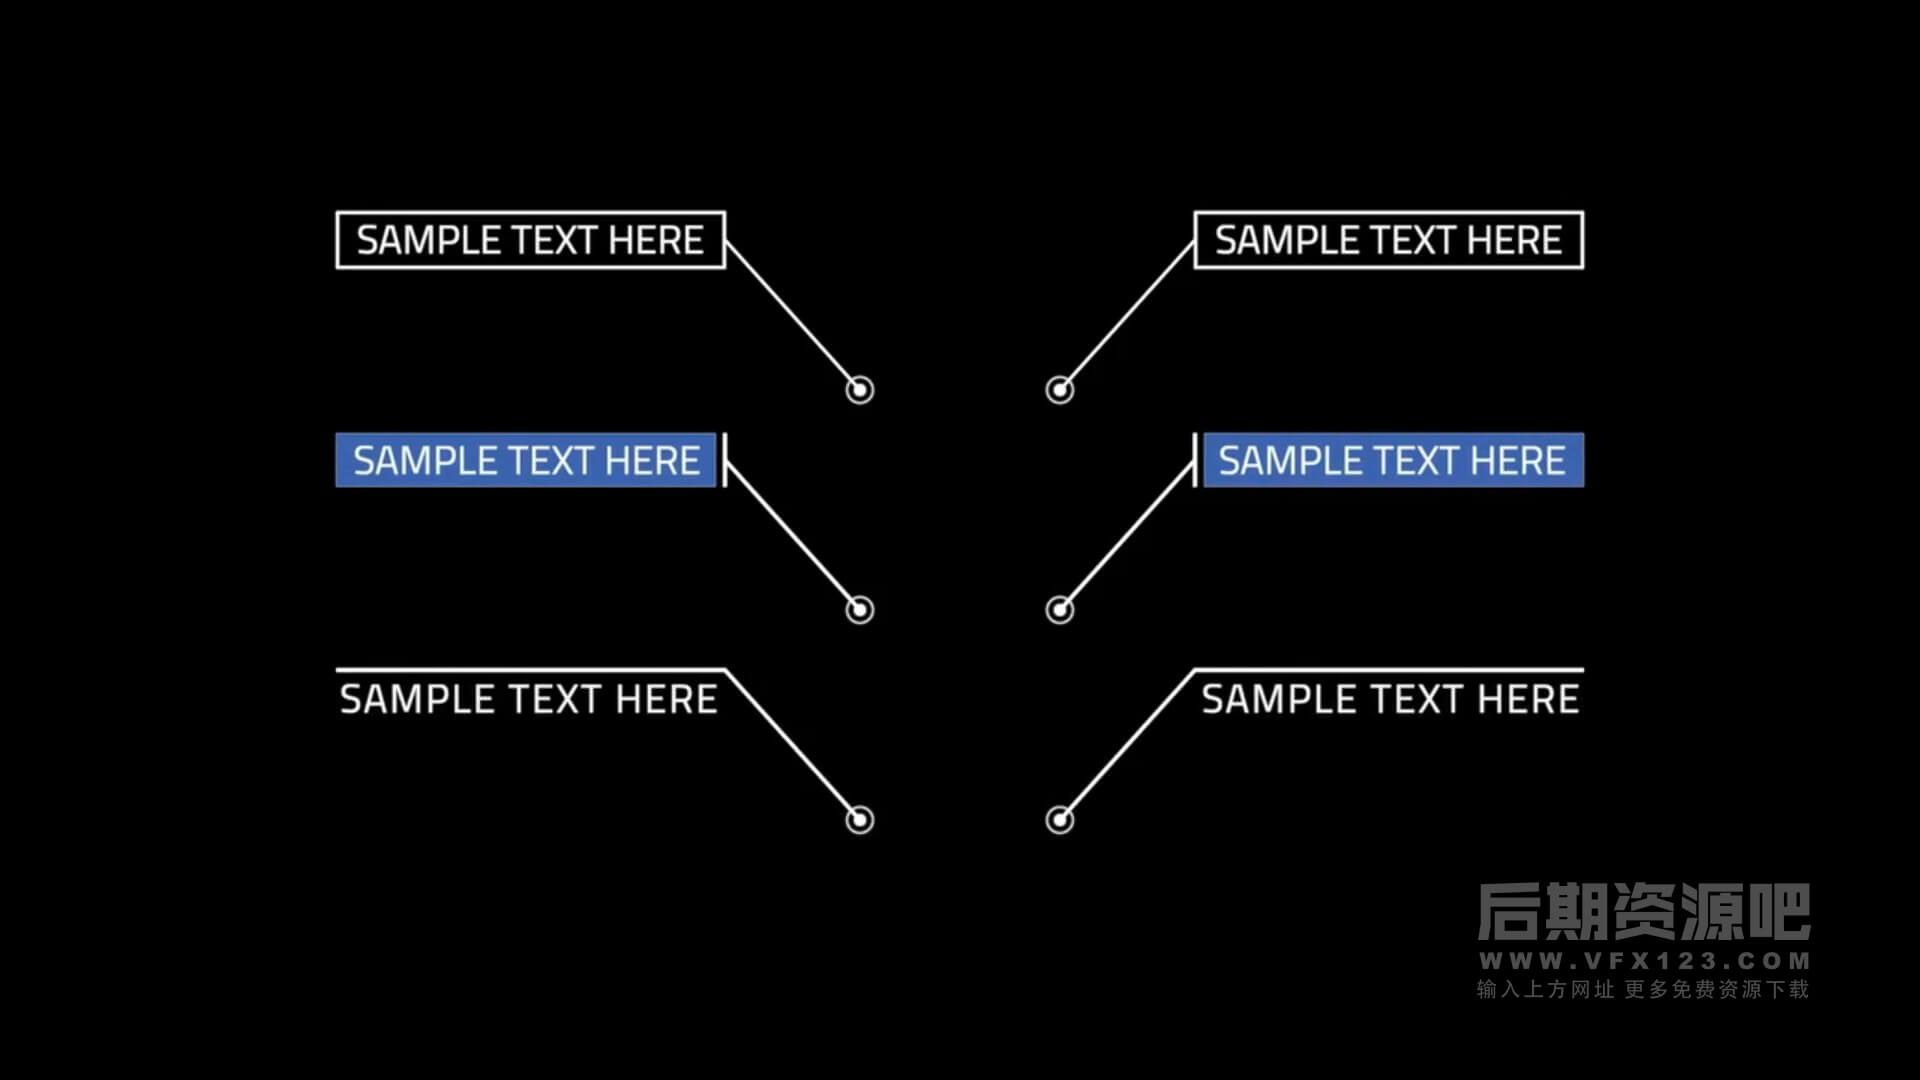 fcpx插件 单行文本线条呼出标注注释动画模板 Call Out